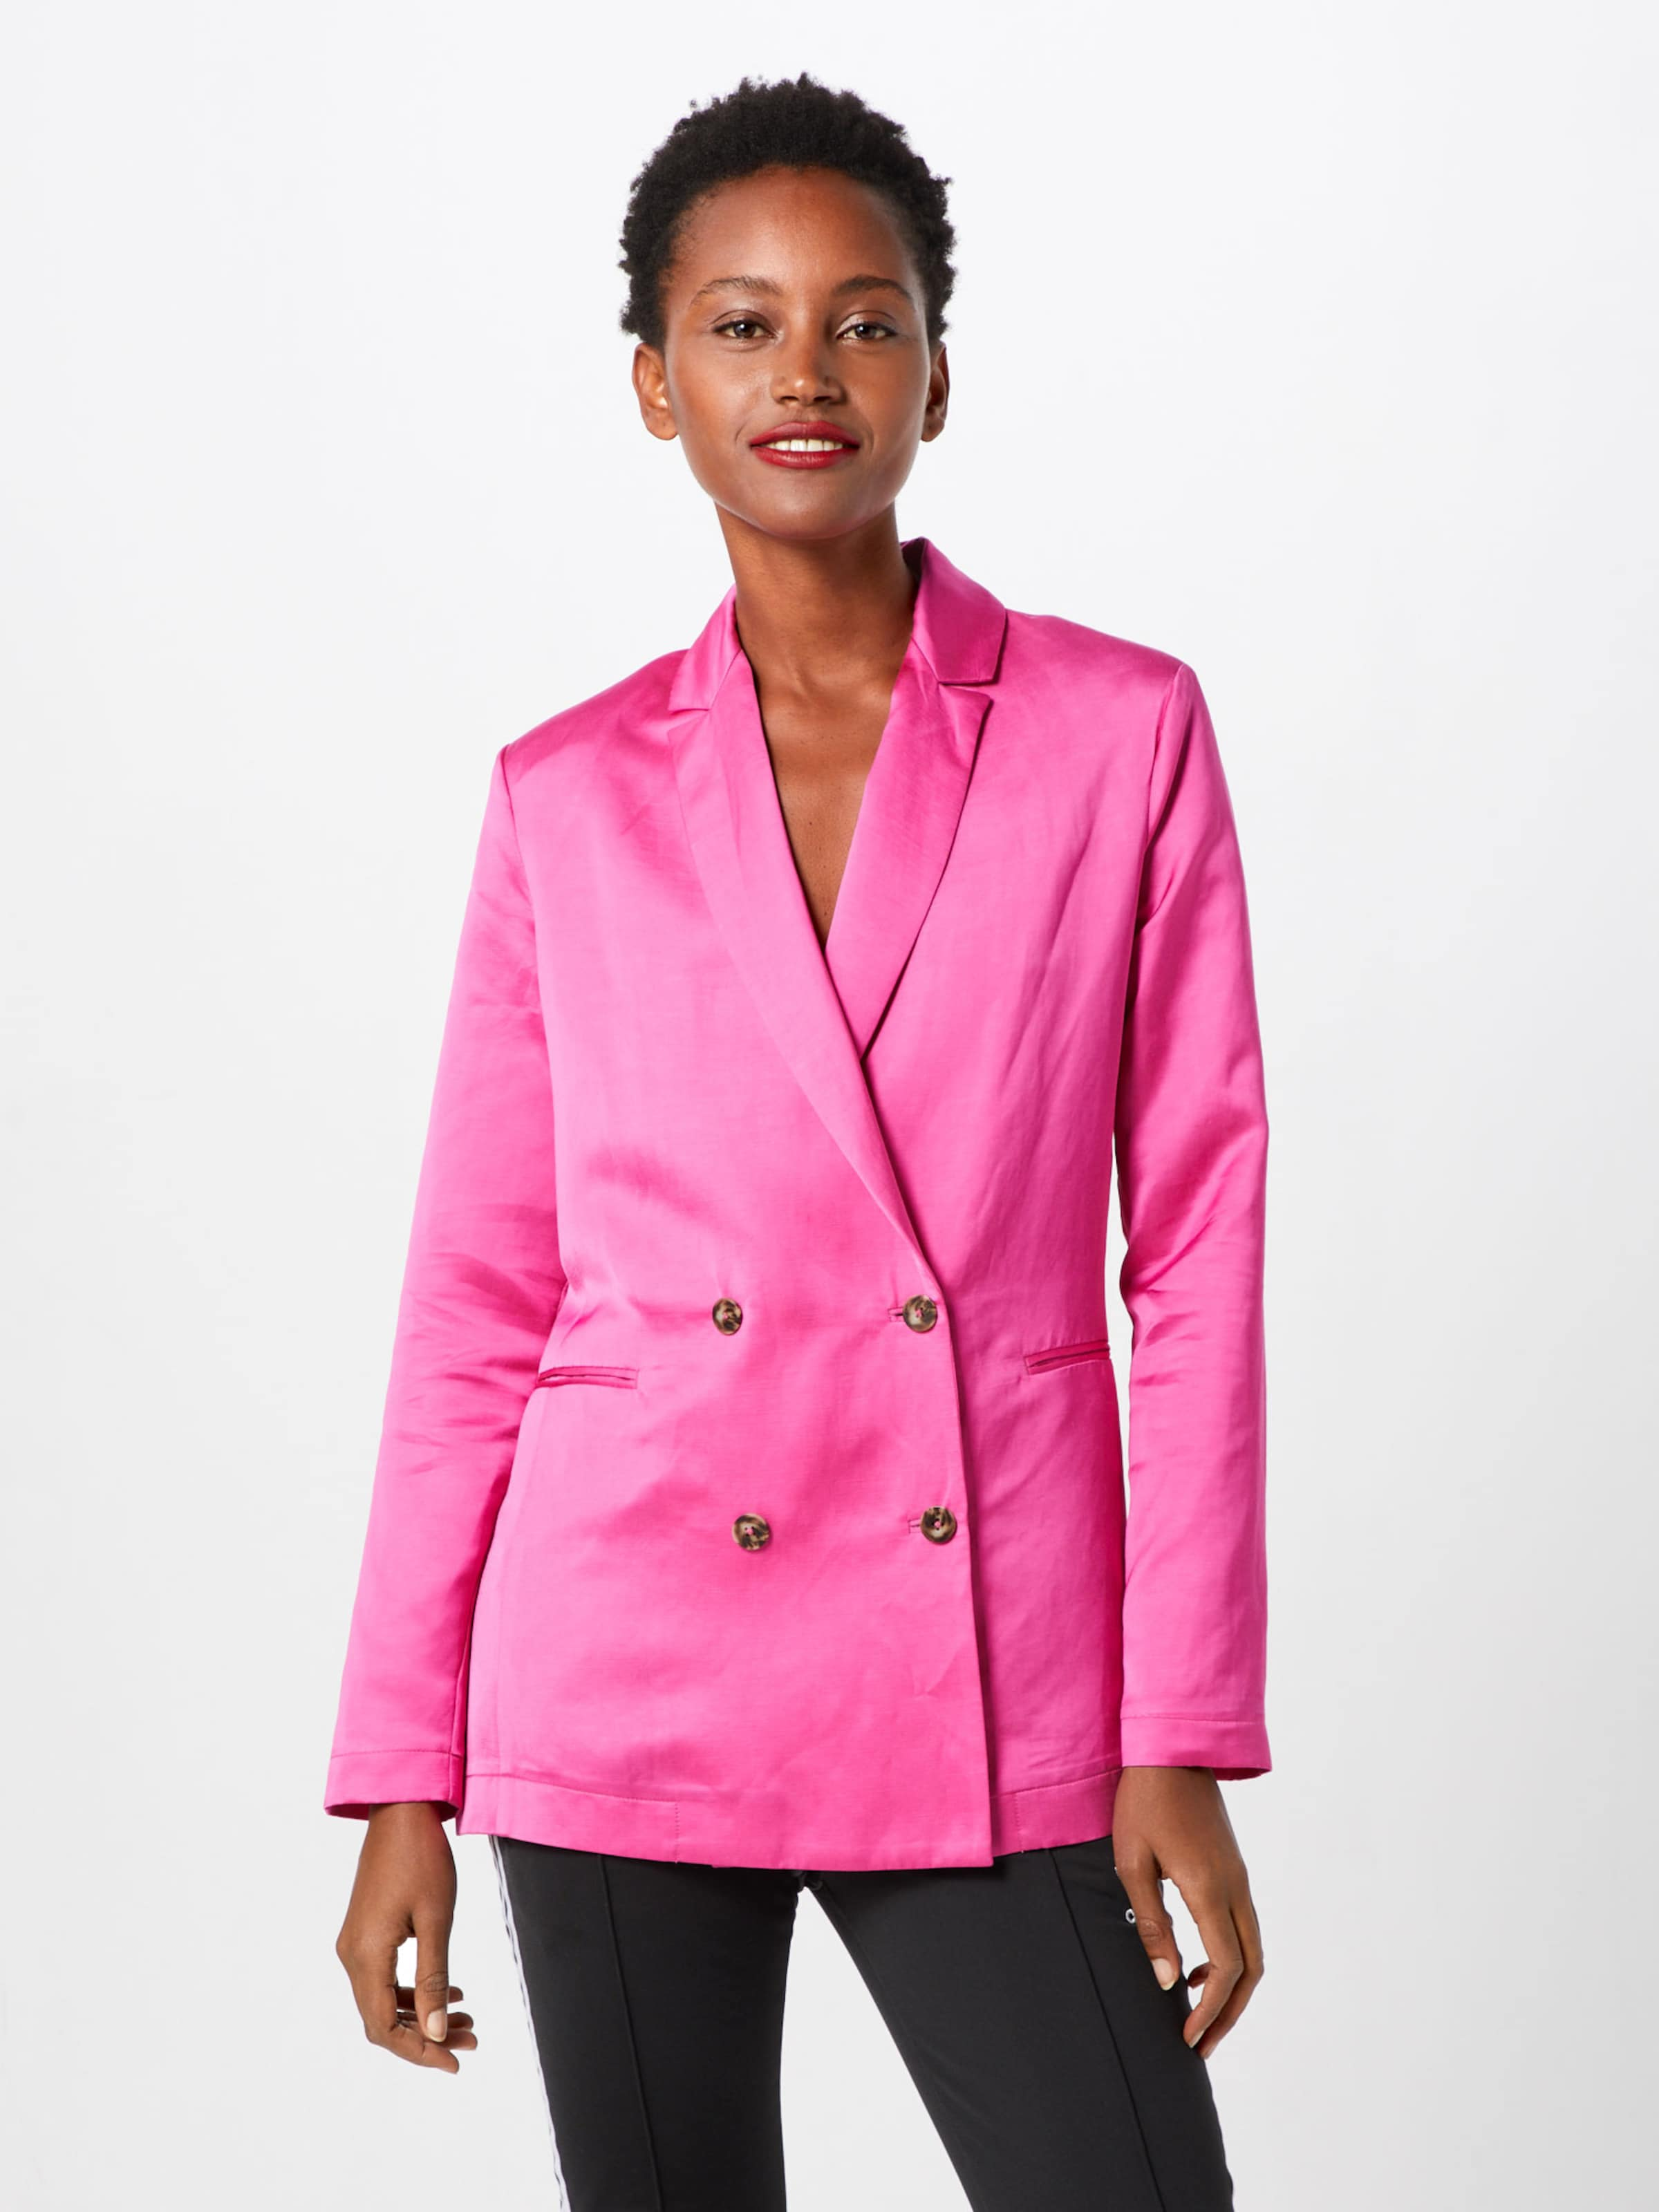 Soda Scotchamp; 'double Pink In Blend' linen Breasted Blazer Viscose rWBedxQCoE